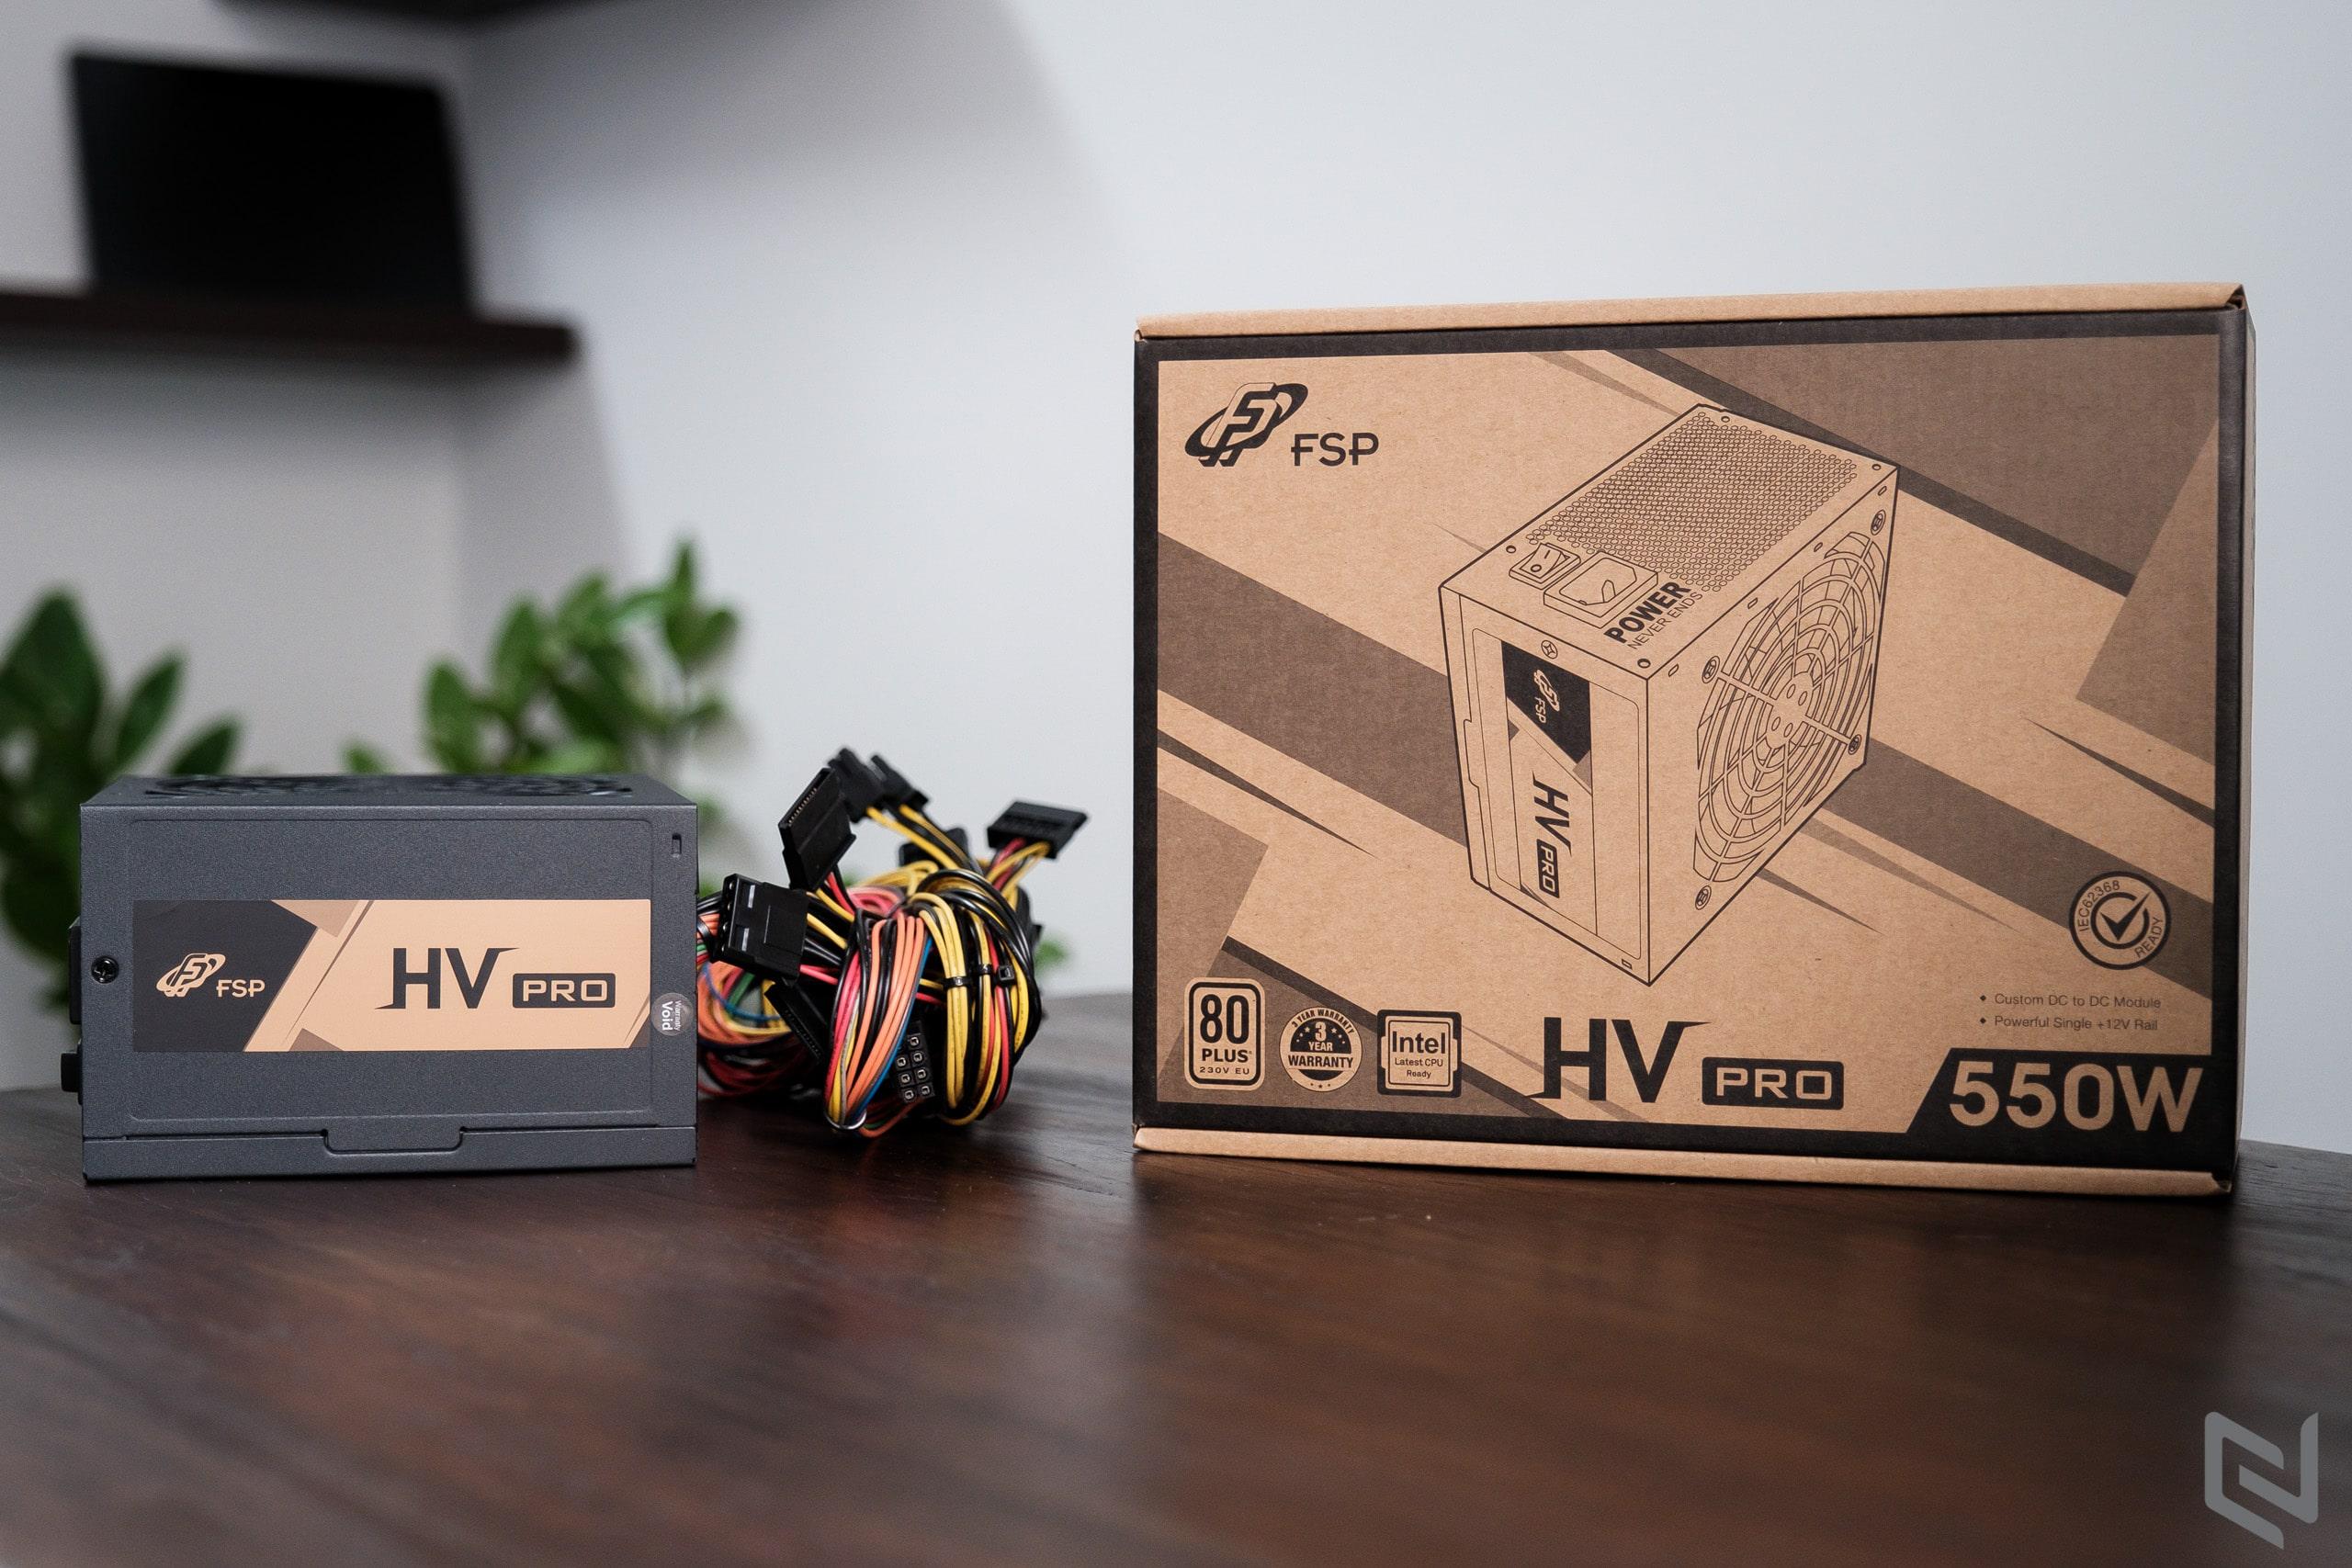 trên tay FSP HV Pro 550W